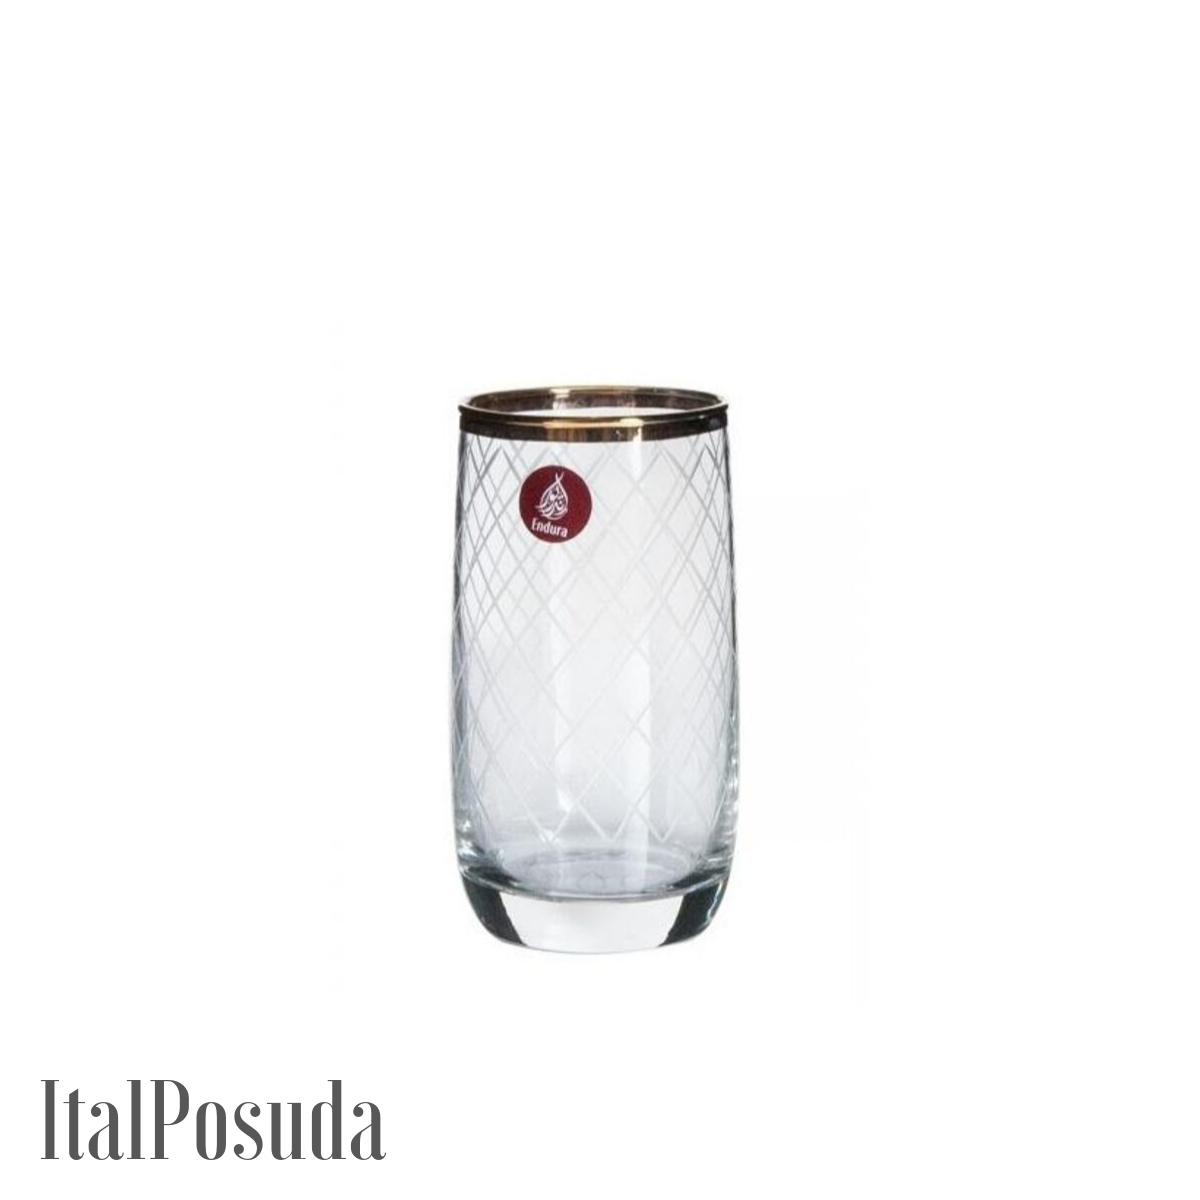 Набор стаканов Endura Gold Net Endura Premium (Голд Нет Эндура Премиум), 6 шт K6517